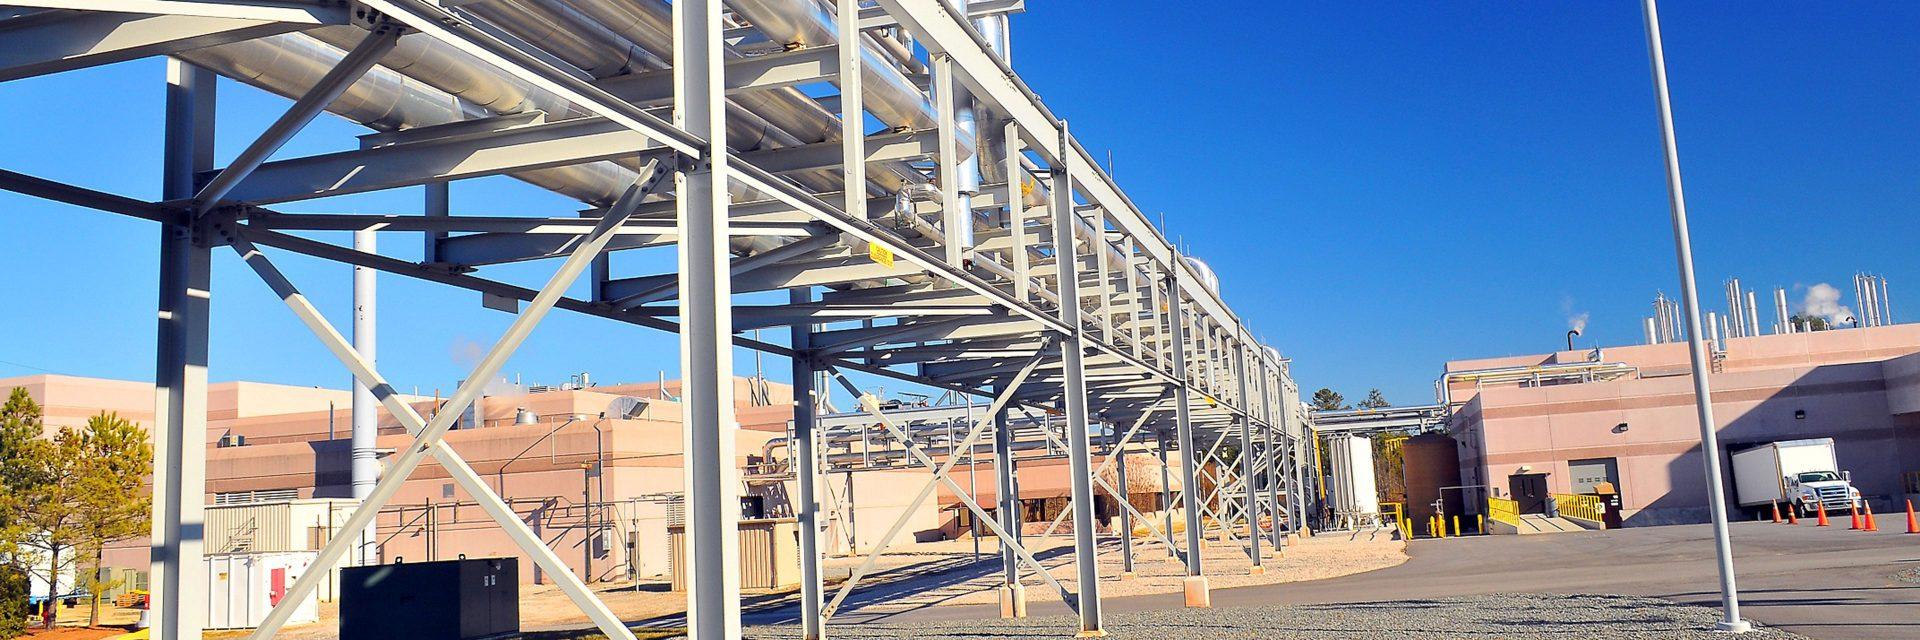 Parenteral Manufacturing Facility Design